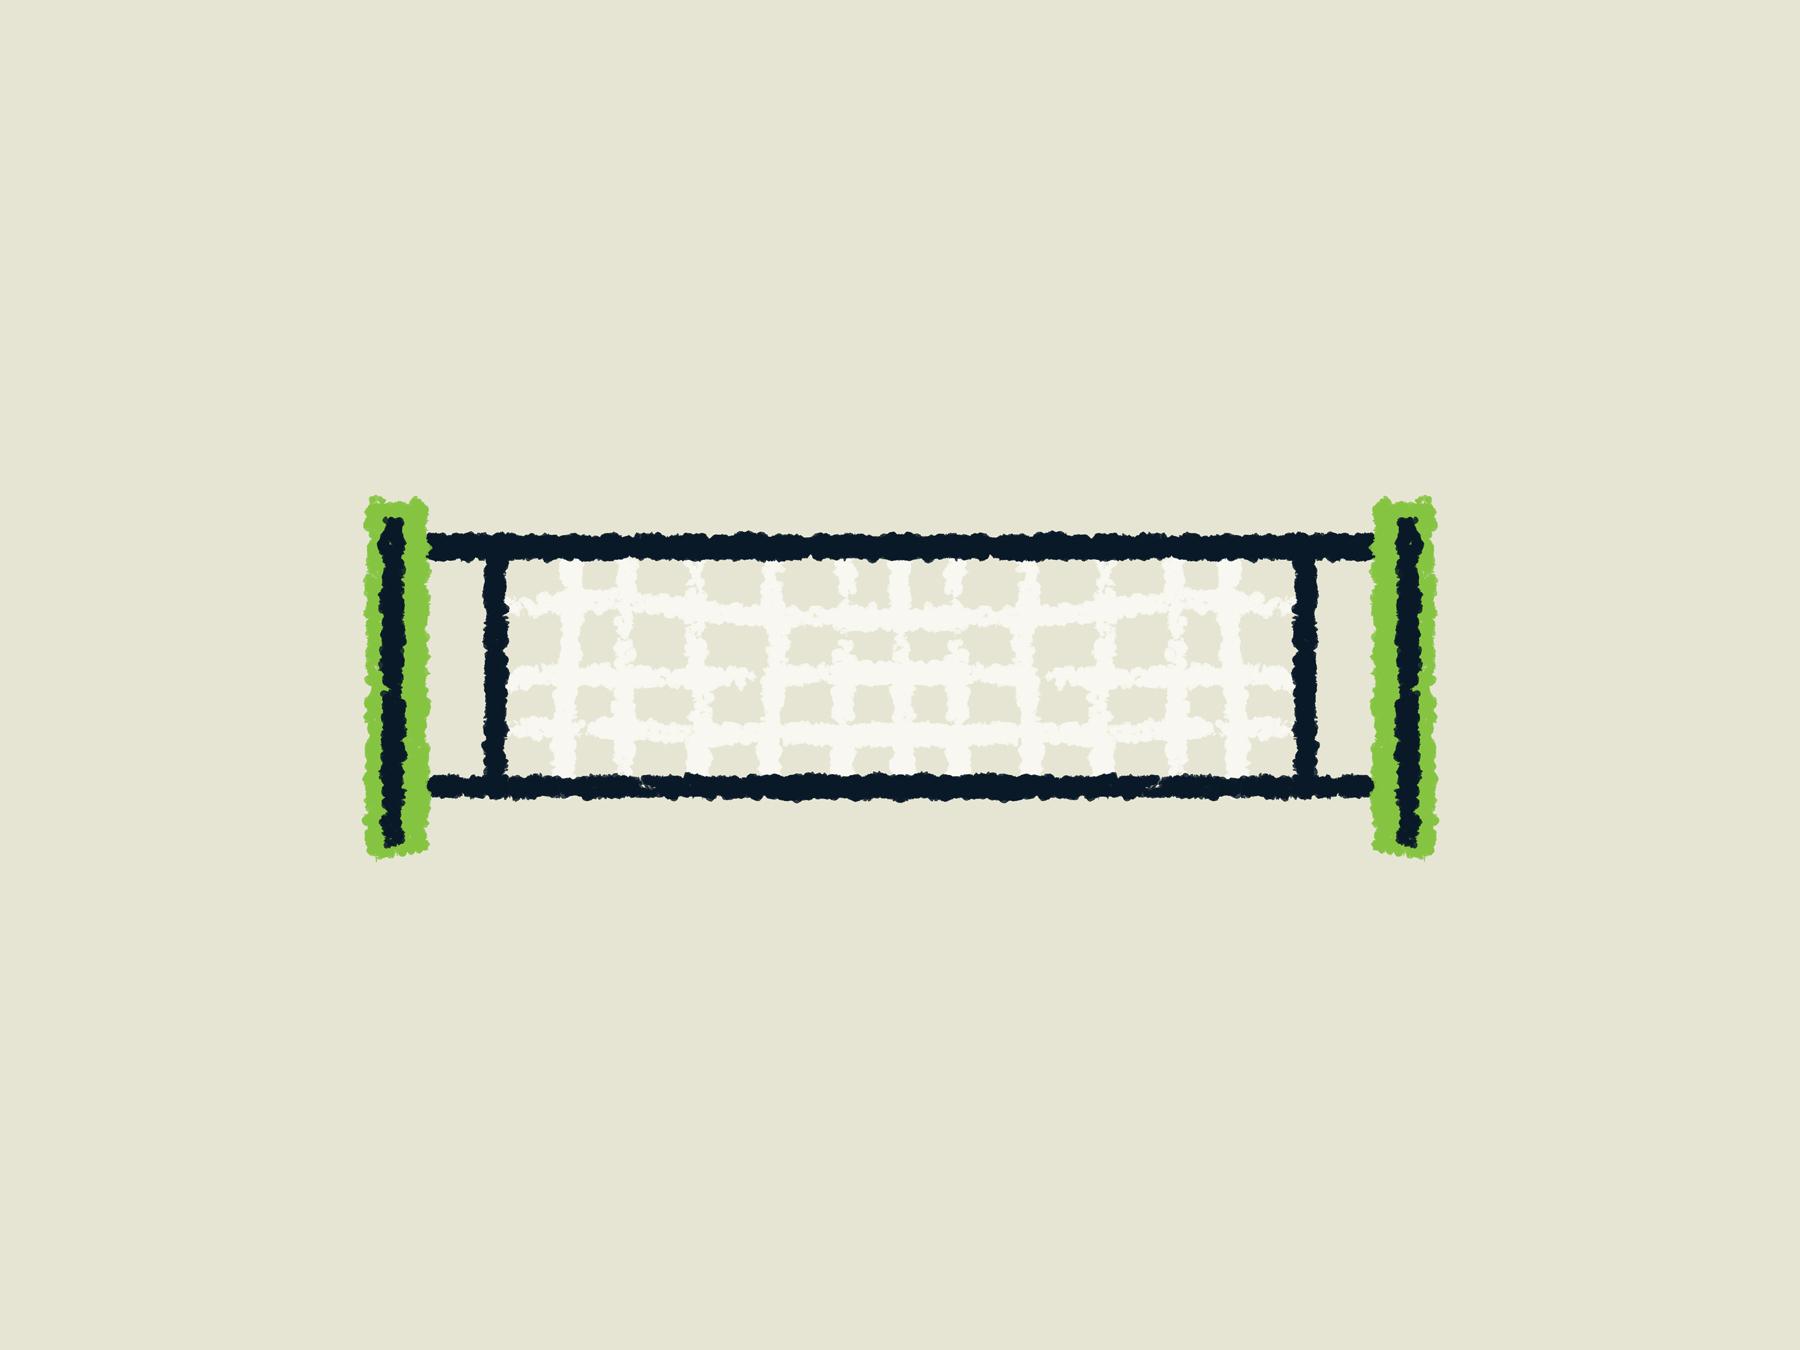 TennisNetWeb.jpg